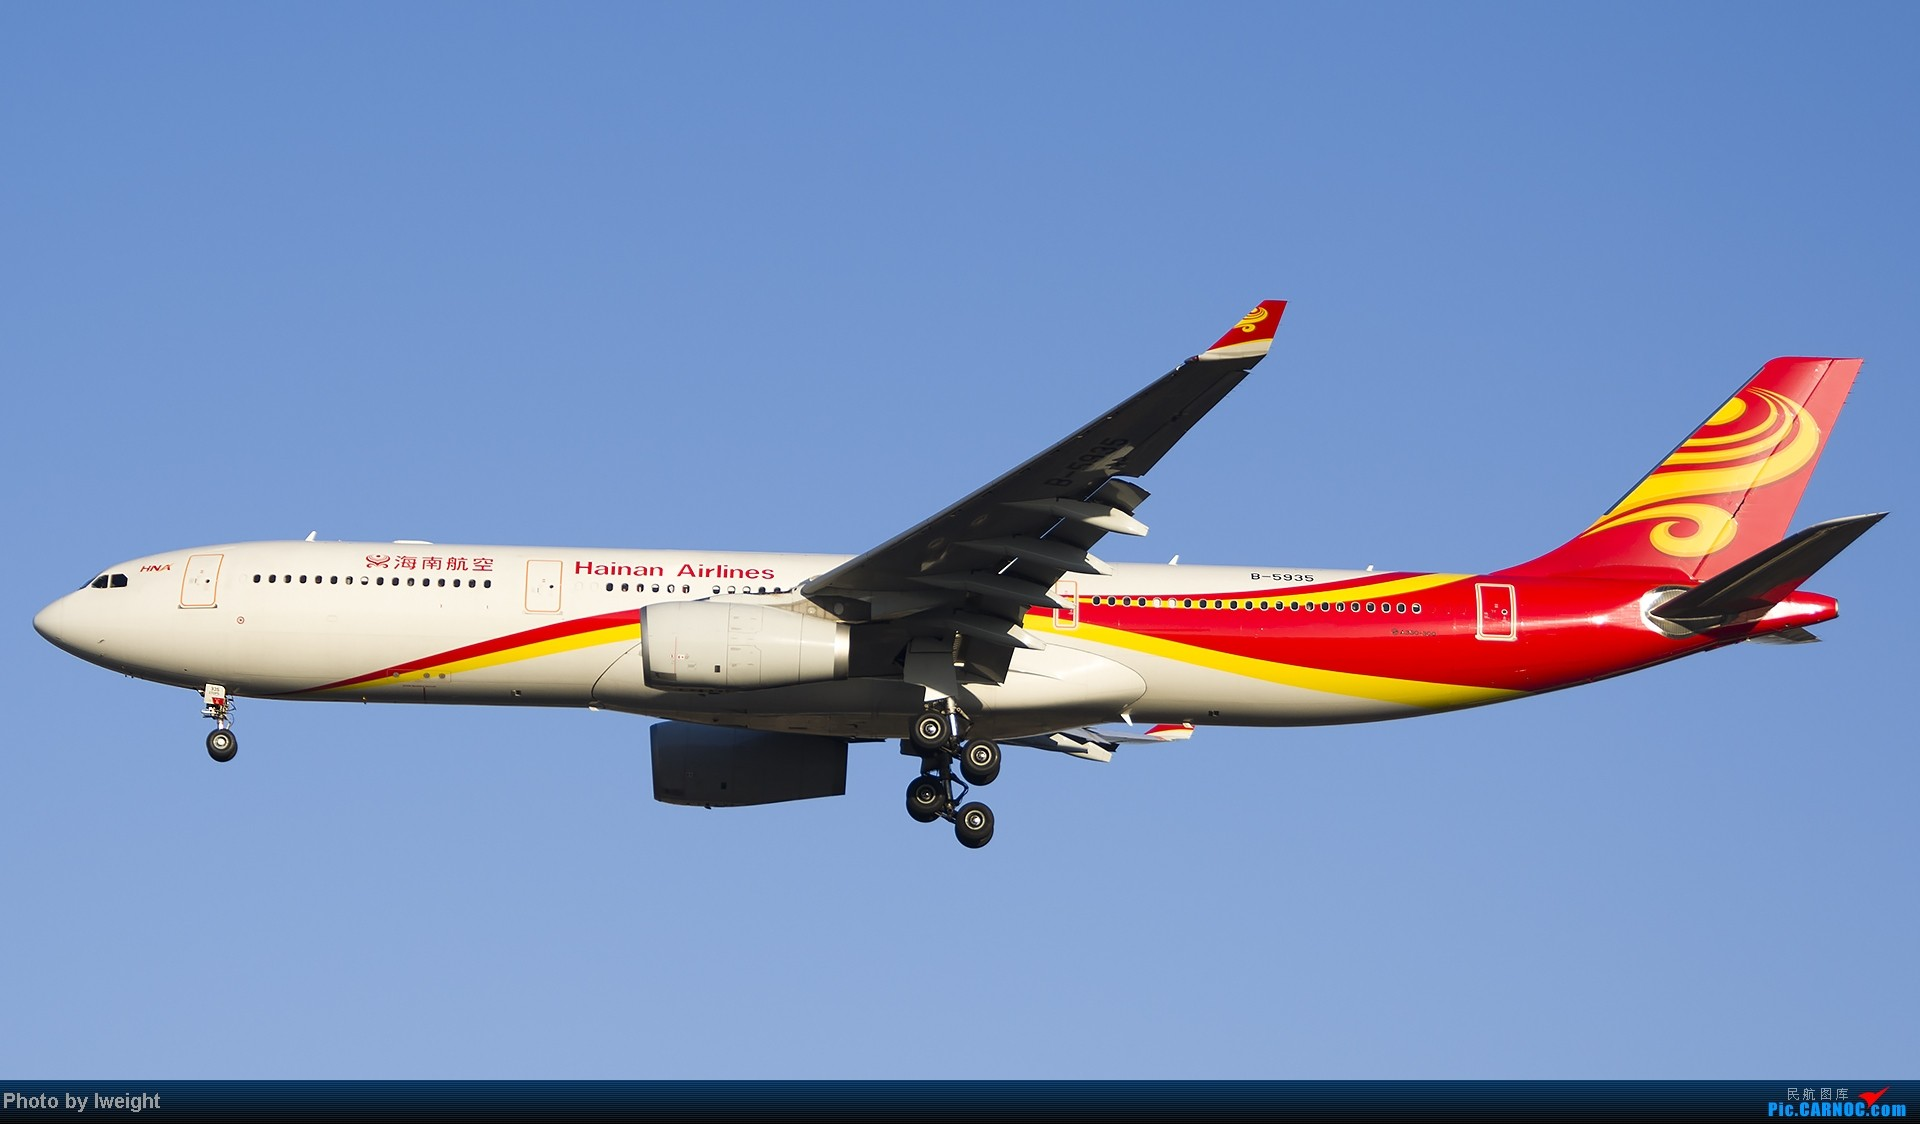 Re:[原创]抓住APEC蓝的尾巴,再拍上一组 AIRBUS A330-300 B-5935 中国北京首都机场